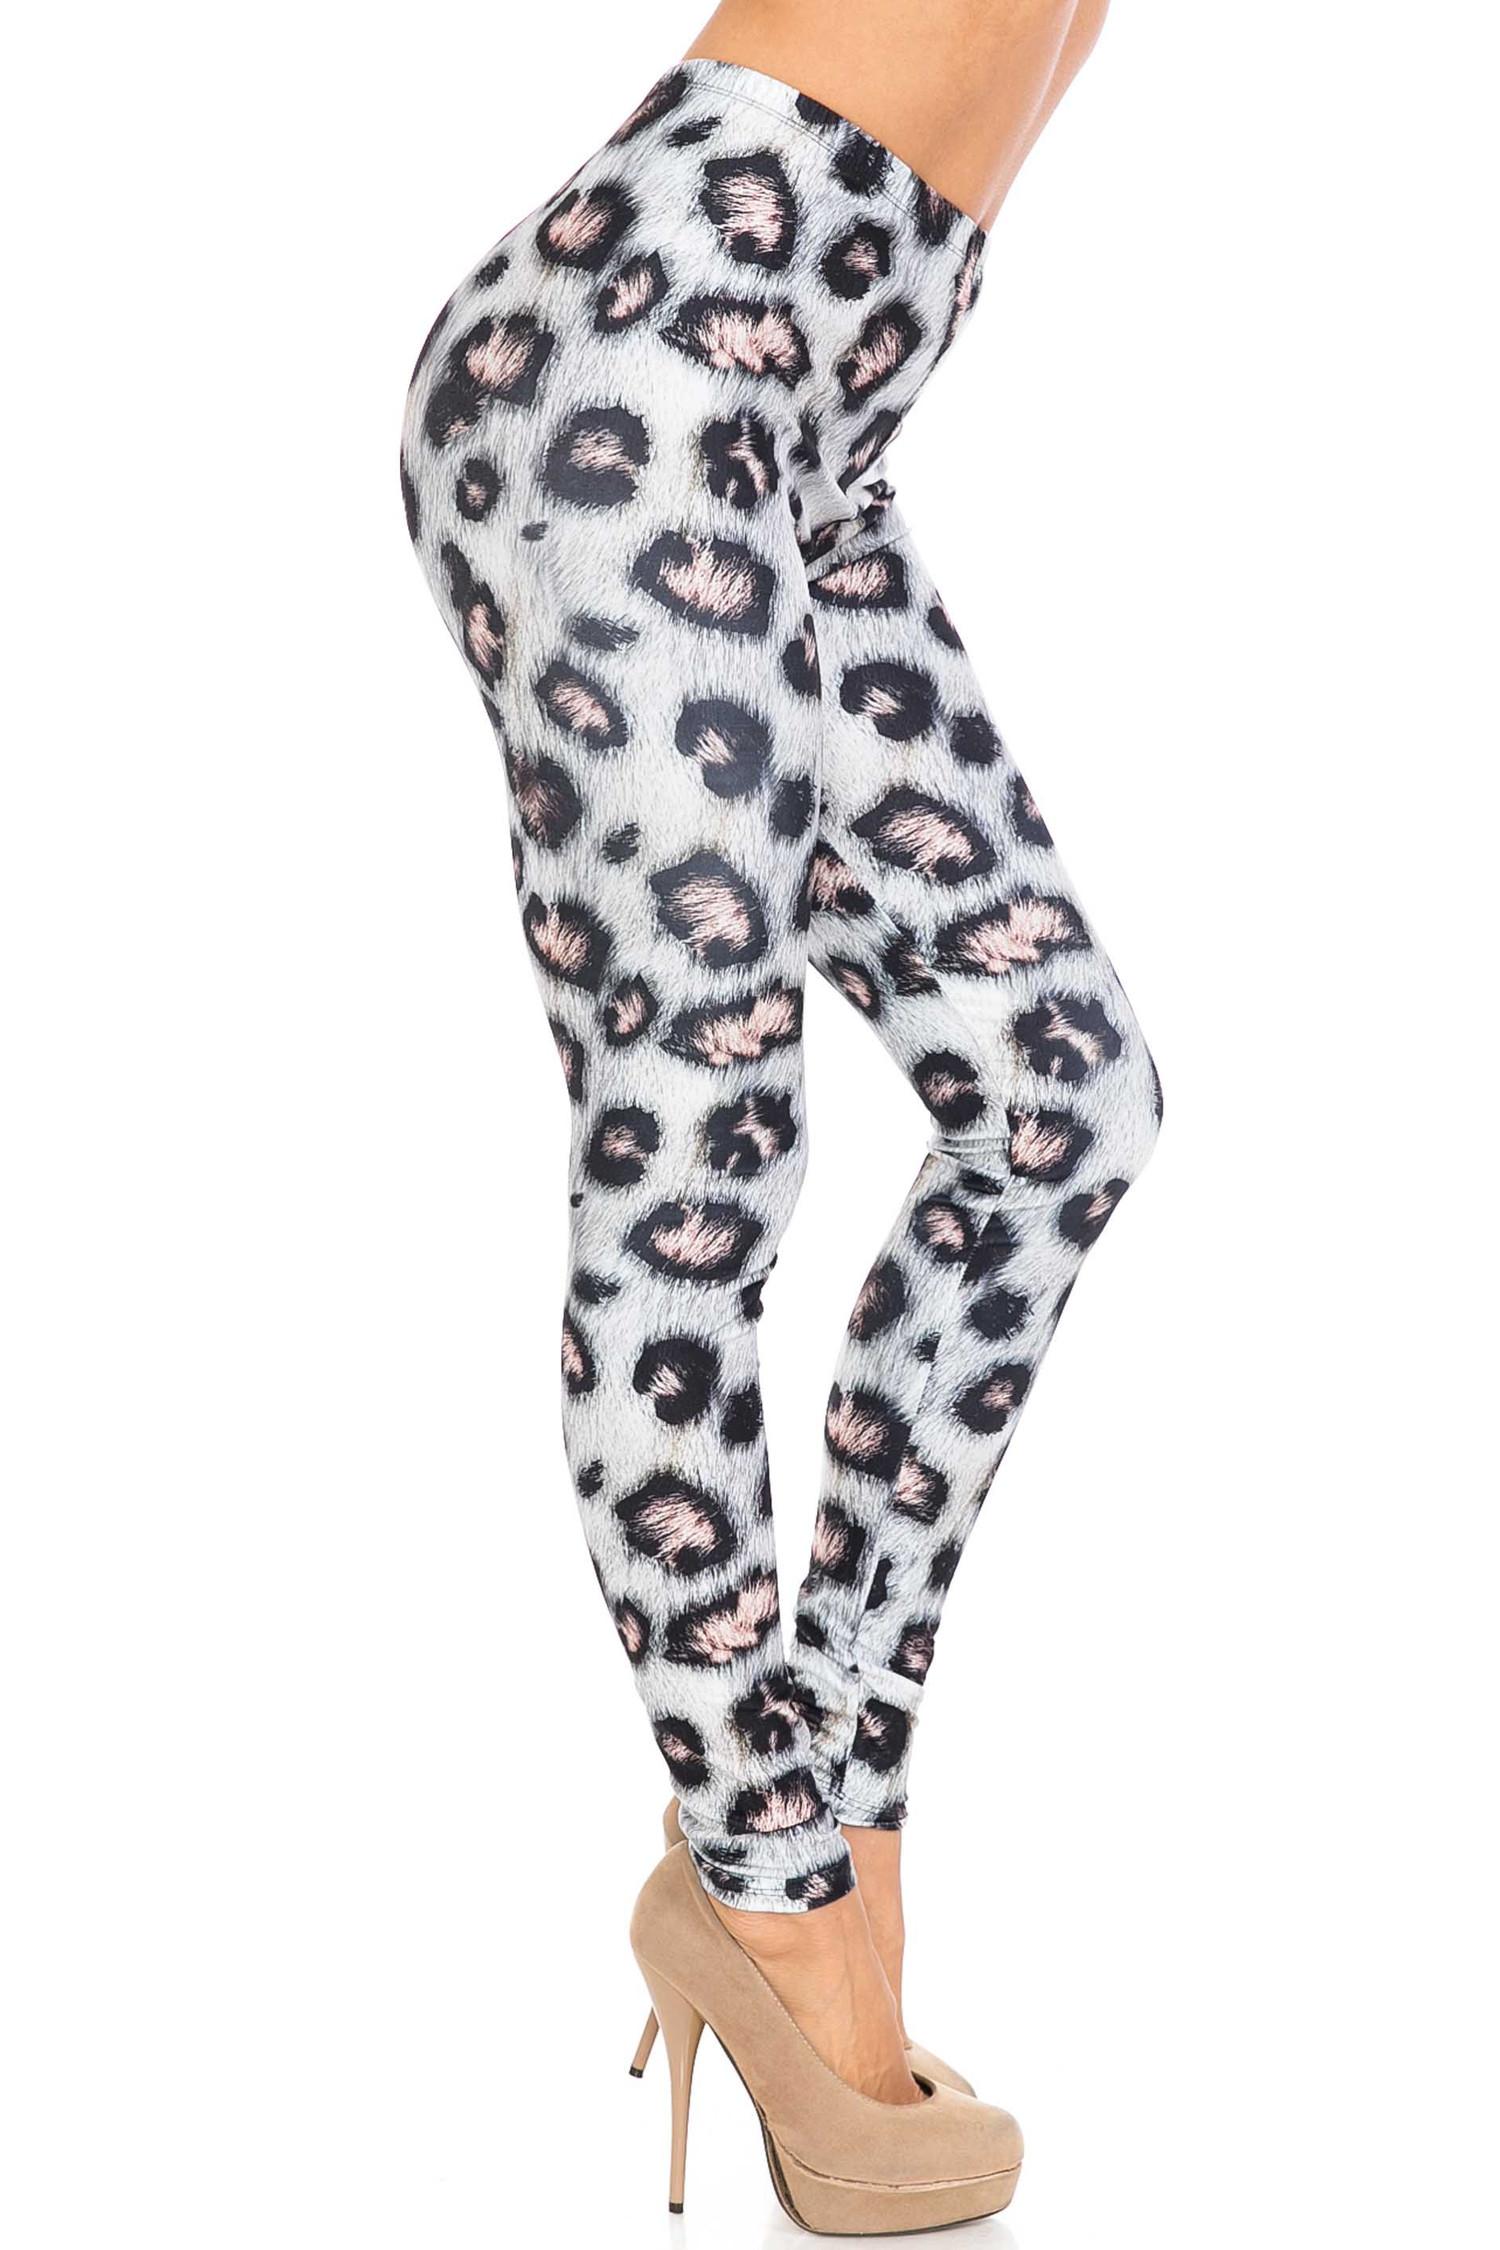 Creamy Soft Moda Leopard Leggings - USA Fashion™